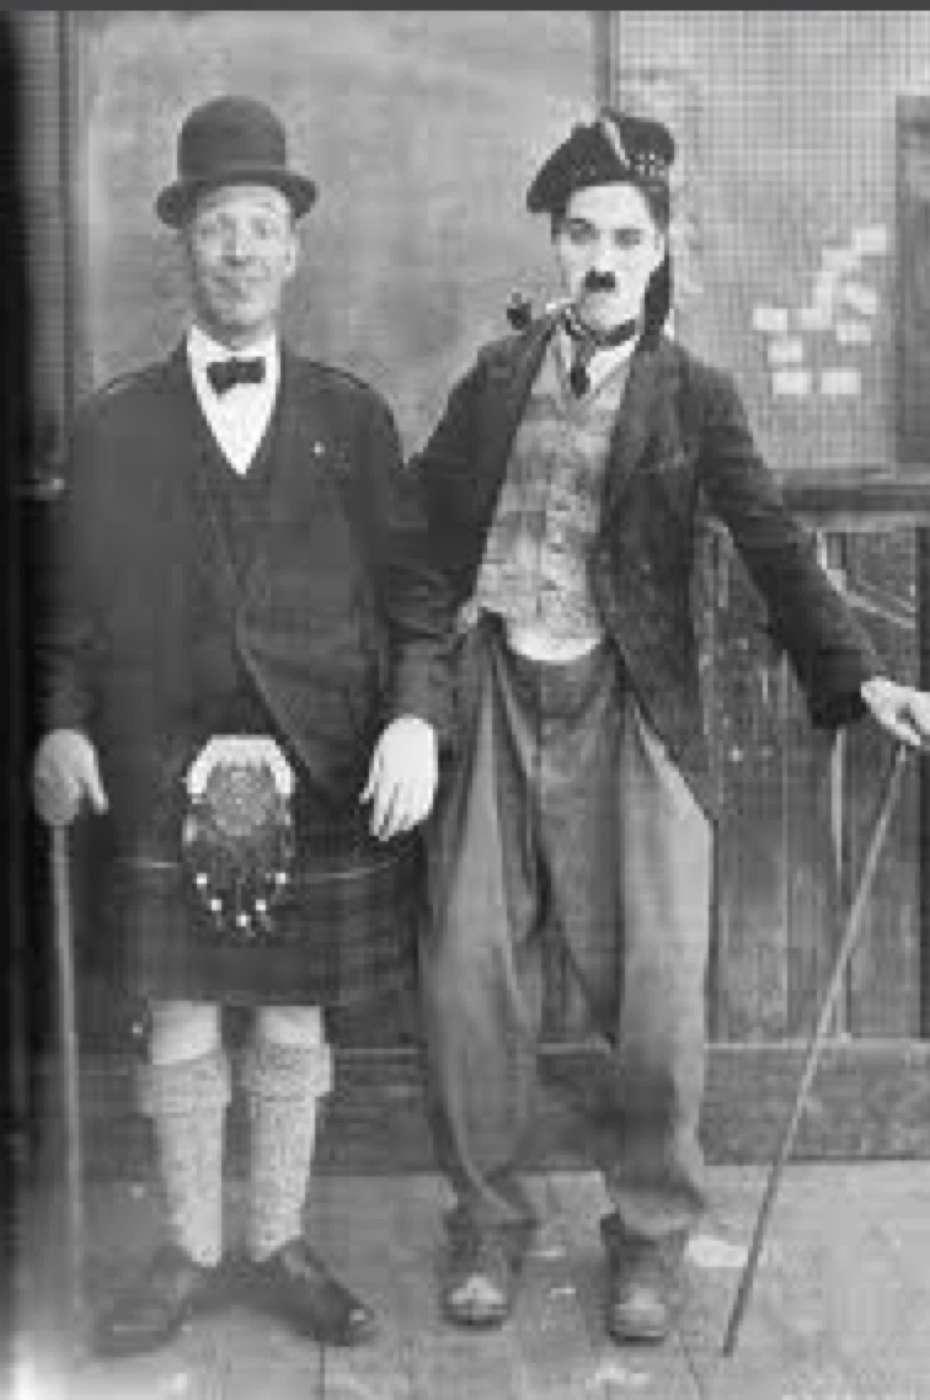 Charlie Chaplin Meets Harry Lauder kapak